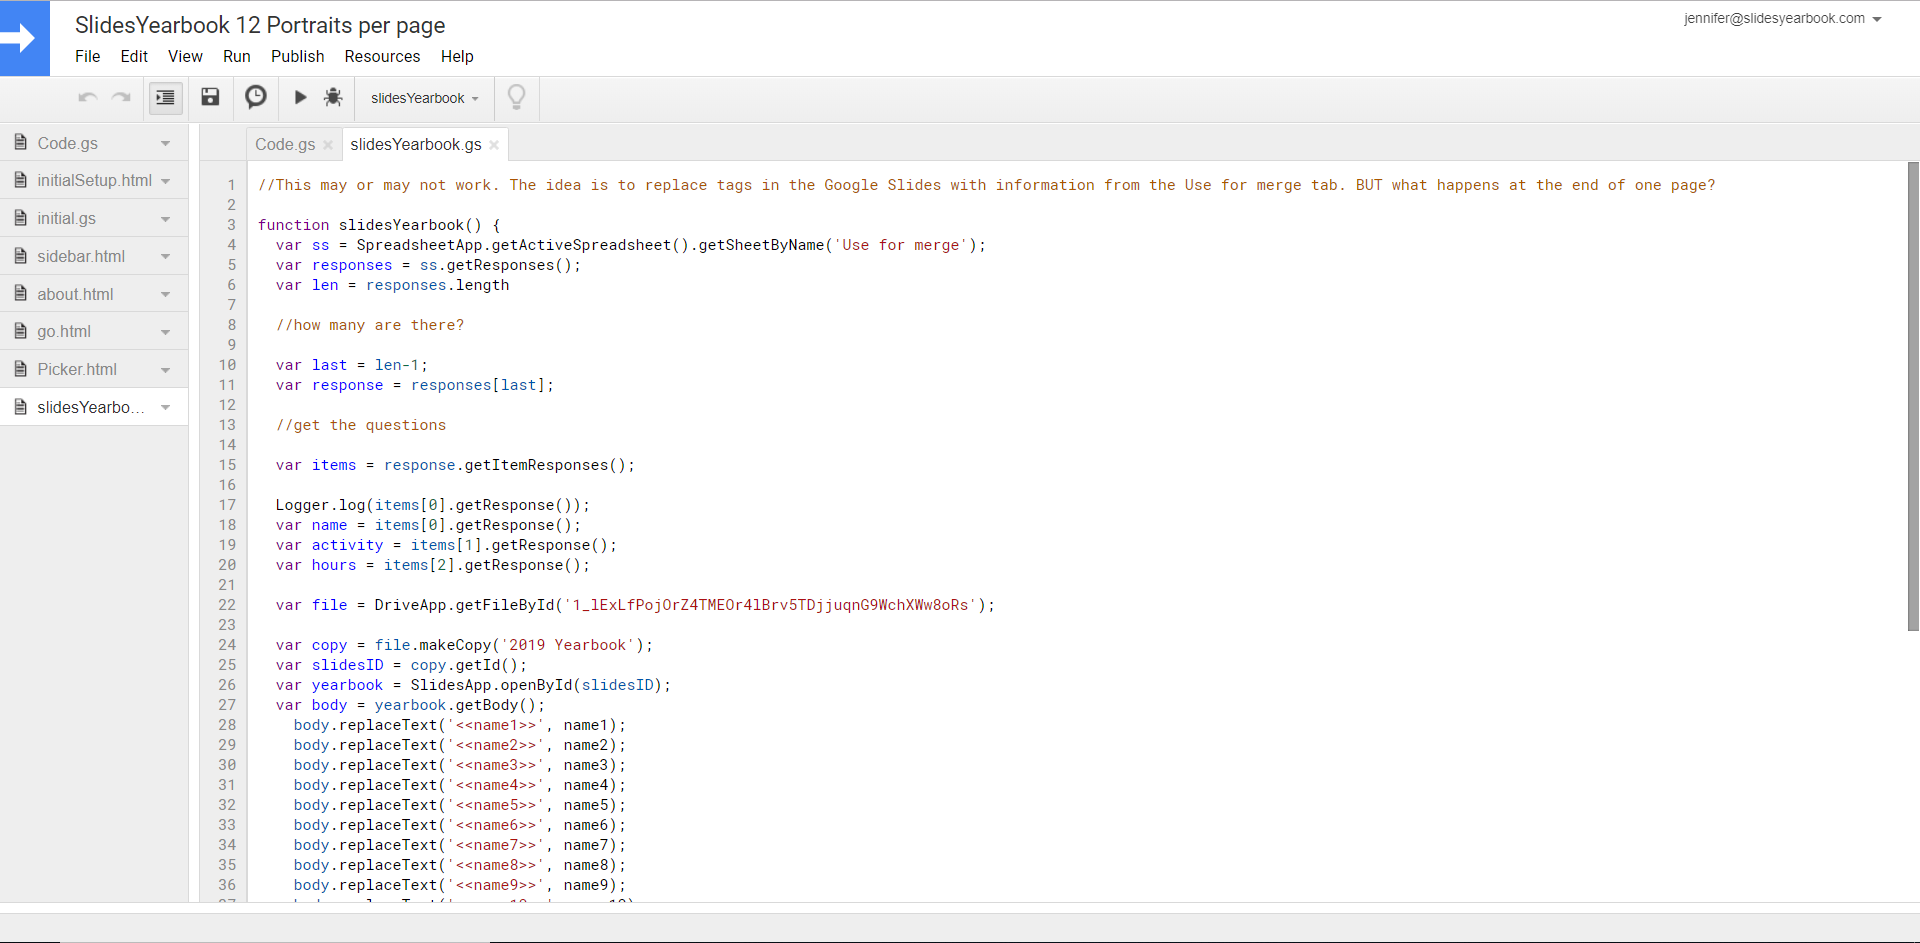 slidesyearbook mail merge prototype